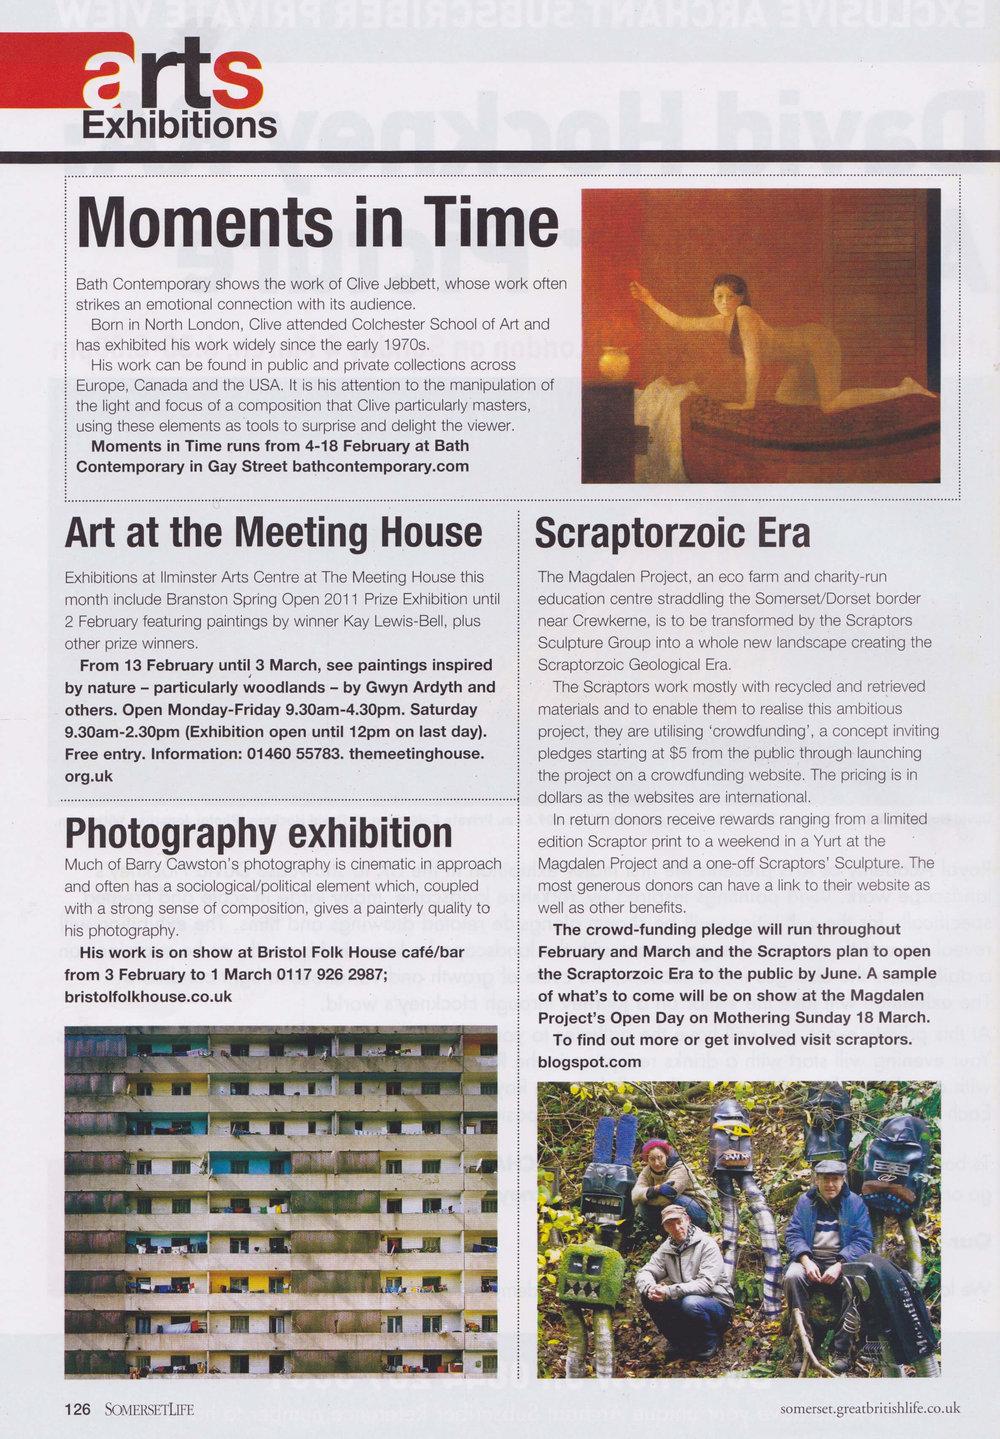 Somerset Life - Scraptors, crowd-funding for Magdalen Project, Feb '12